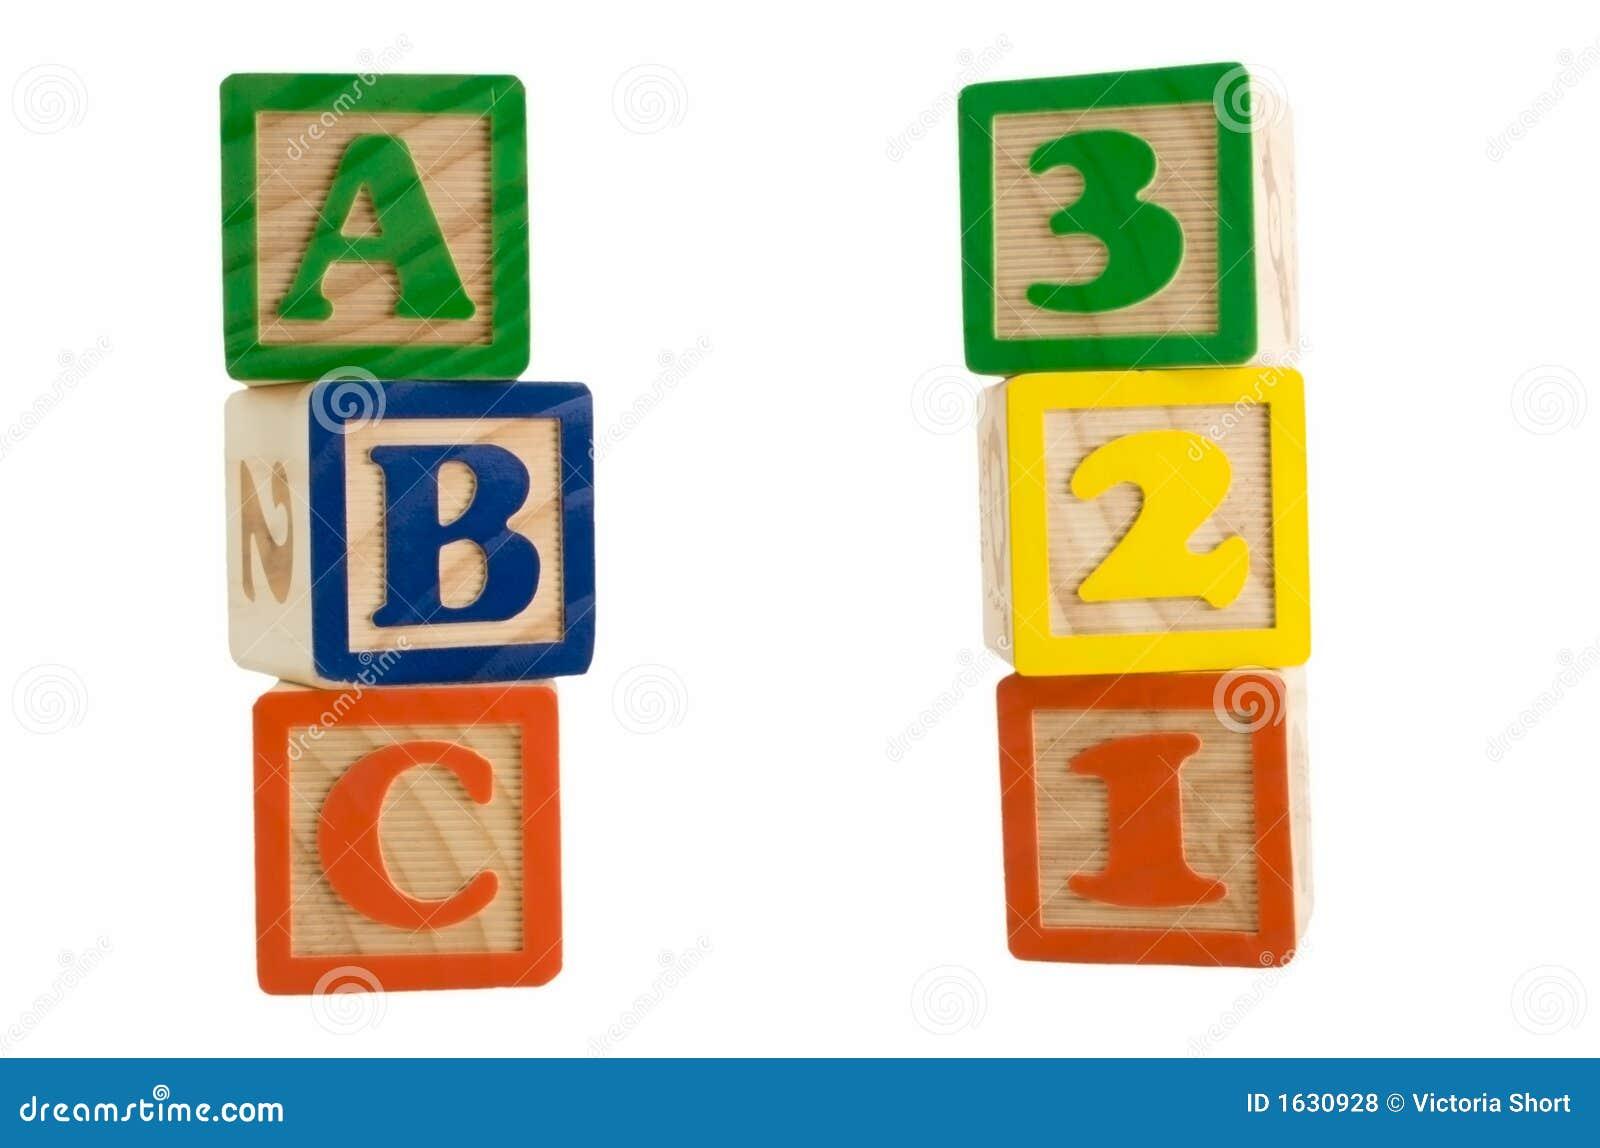 ABC 123 Blocks Royalty Free Stock Photos - Image: 1630928